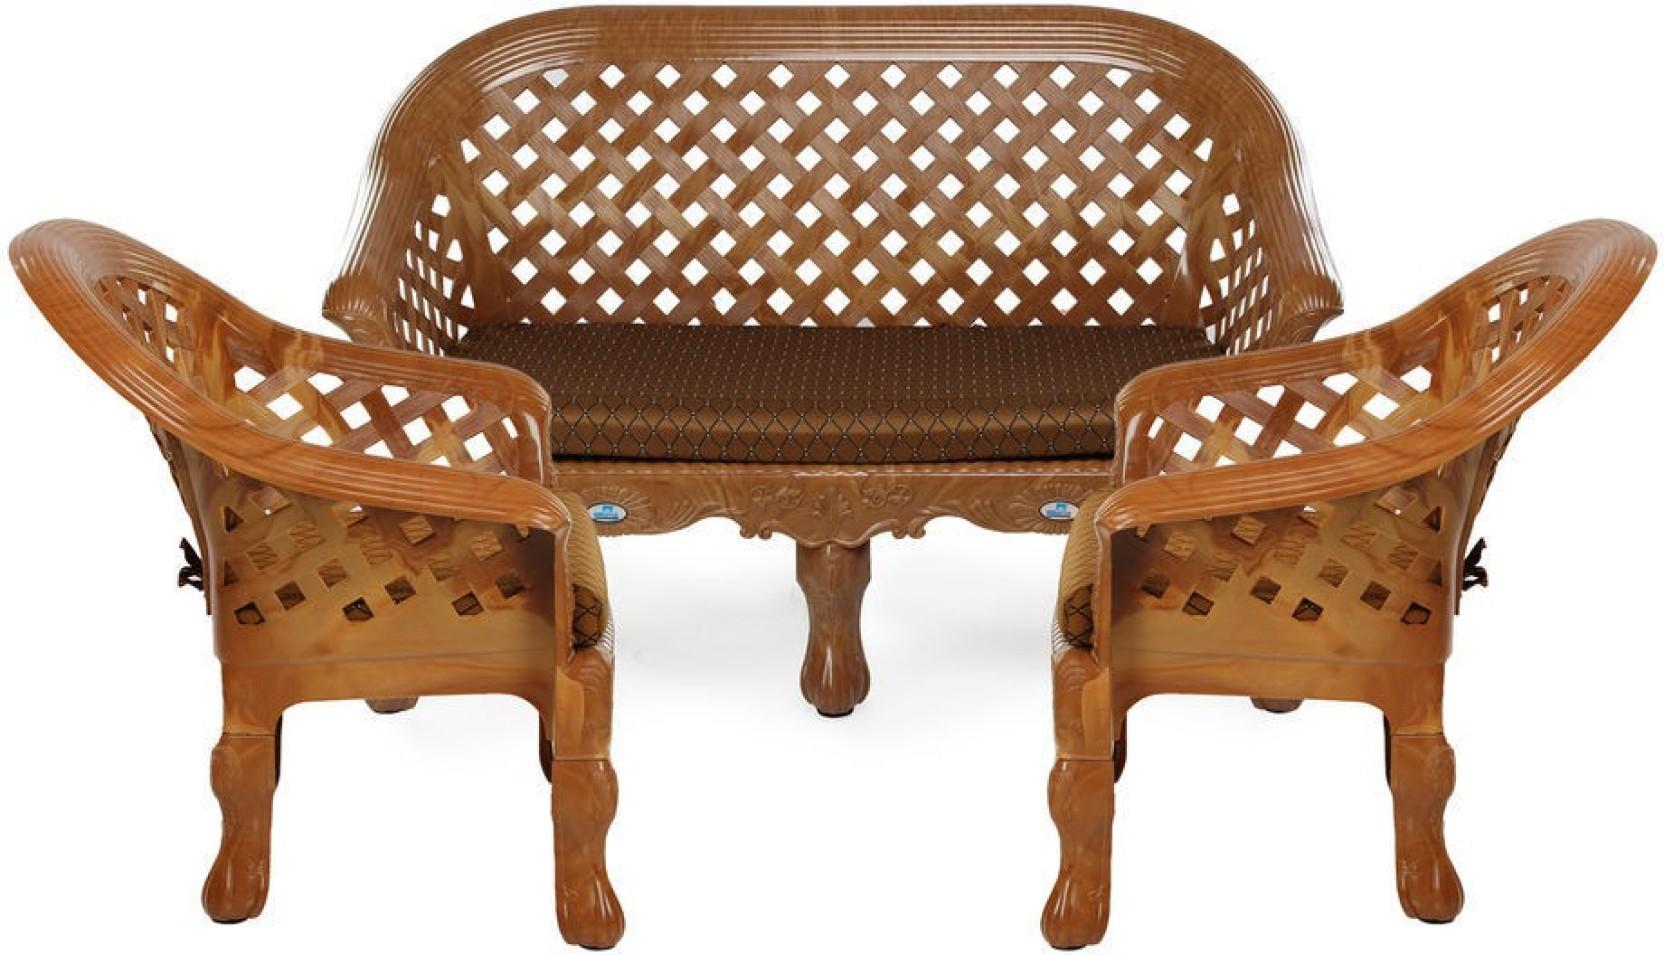 Nilkamal Luxura Fabric 2 1 1 Sofa Set Price In India Buy Nilkamal Luxura Fabric 2 1 1